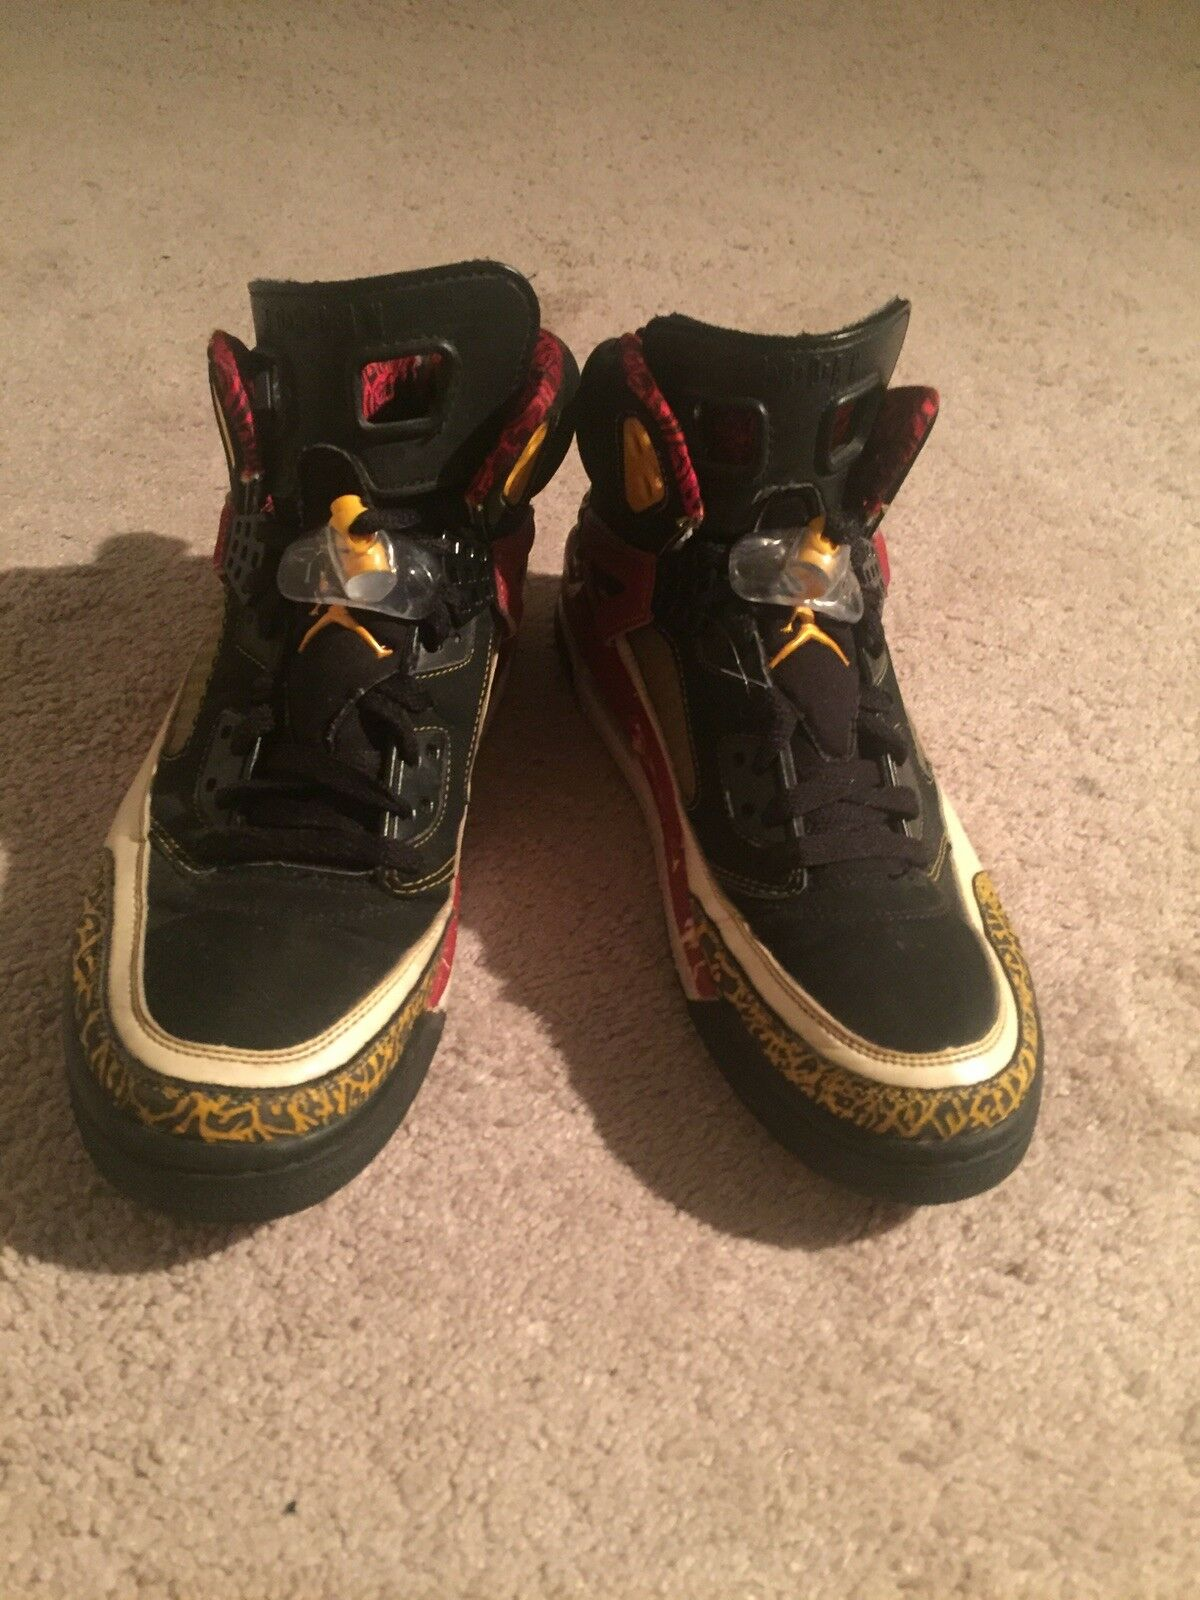 Nike air jordan ist spizike spizike spizike kings county größe 10,5 3c4583